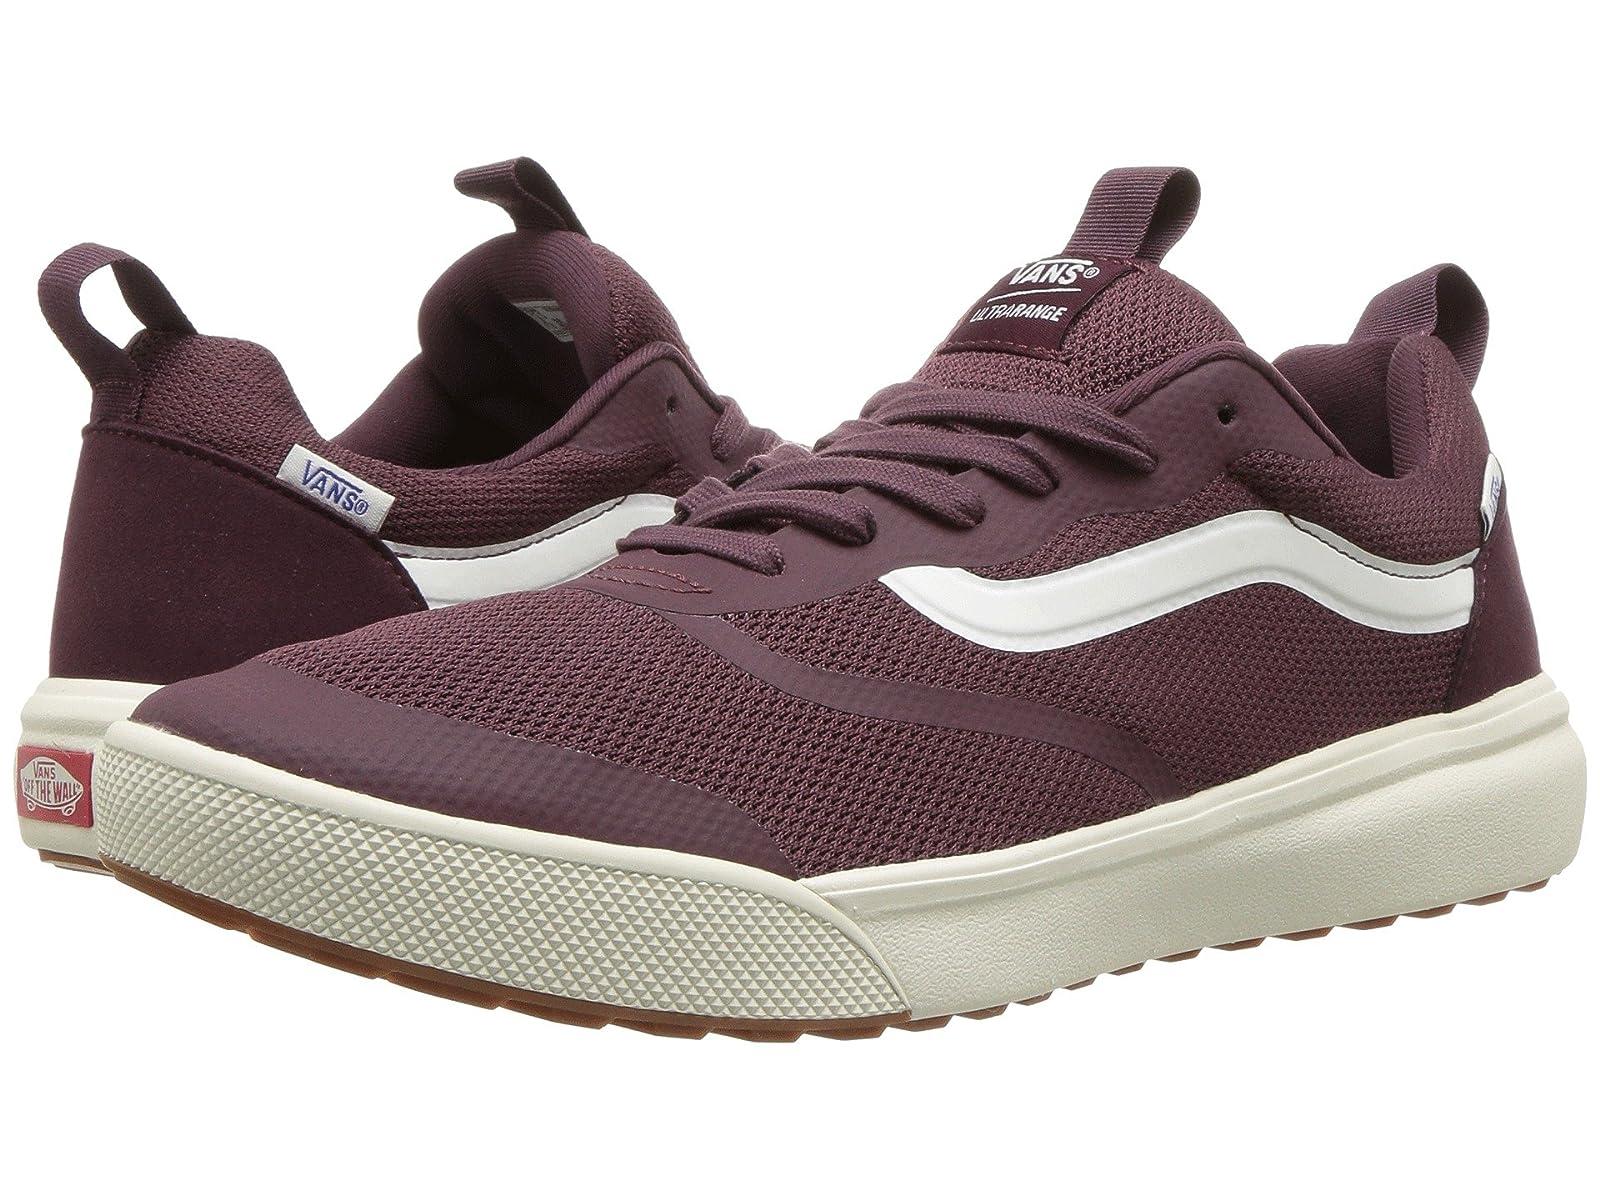 Vans UltraRange RapidweldAtmospheric grades have affordable shoes